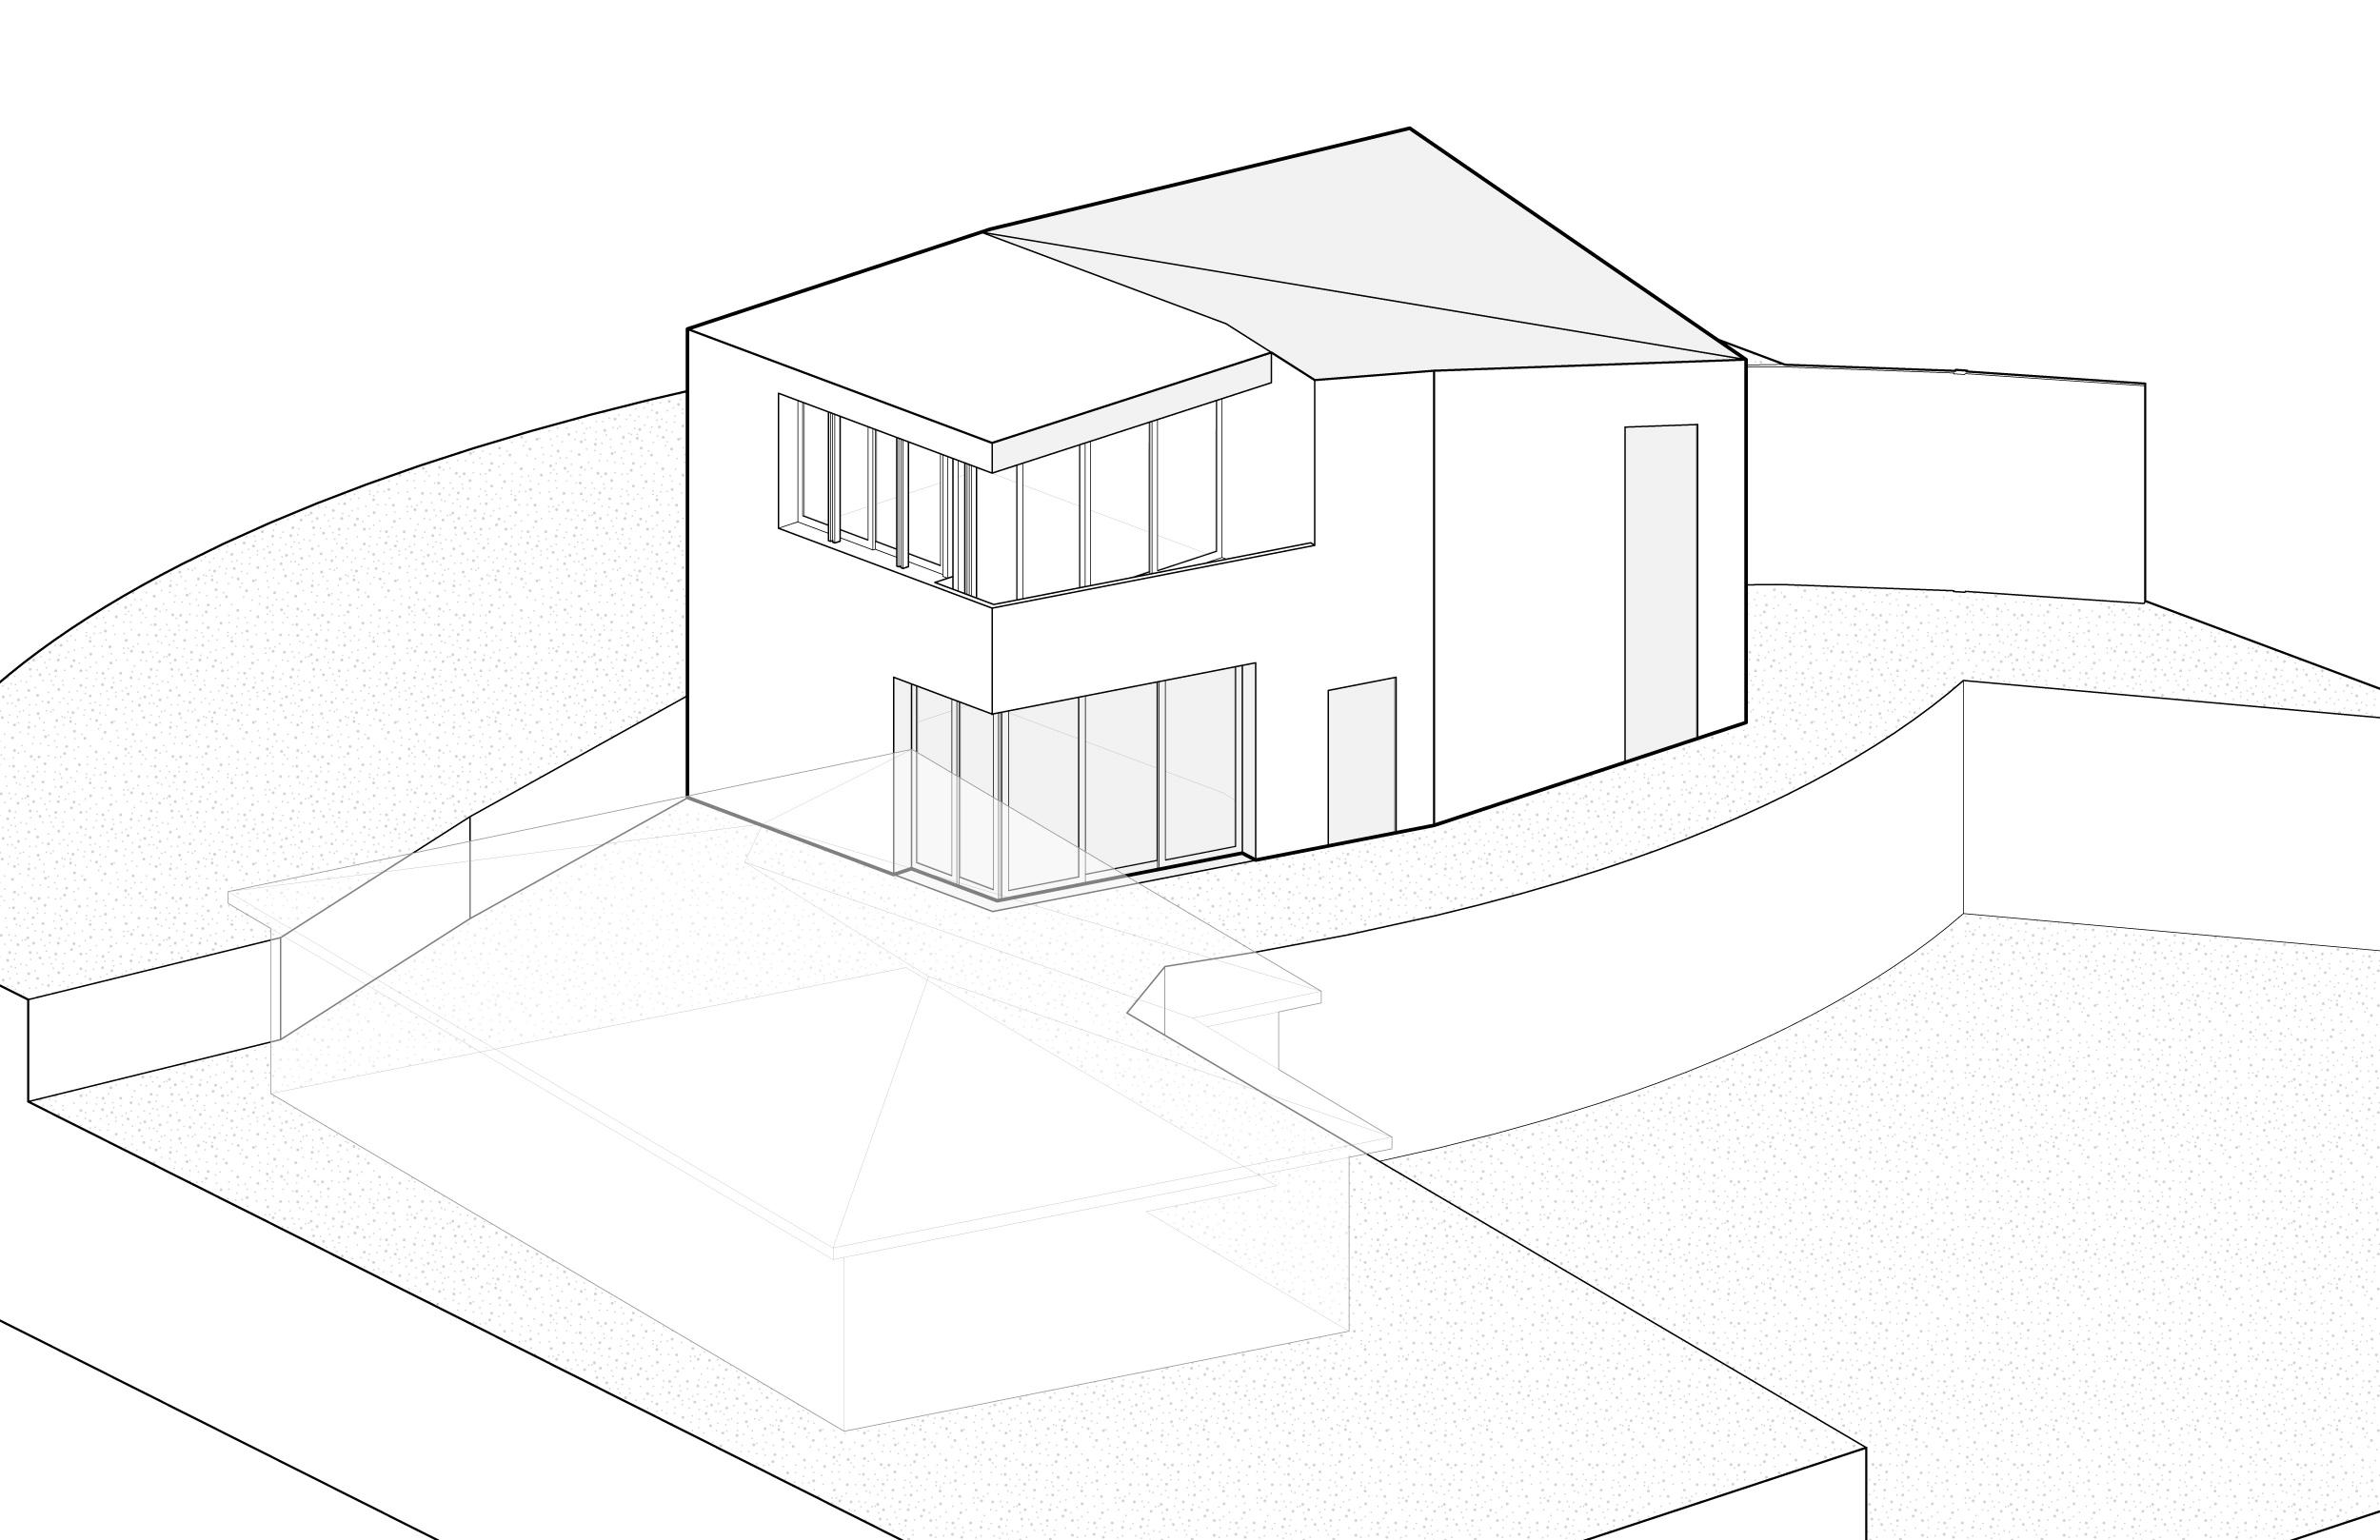 La-Cuesta-House_Diagram_06.jpg